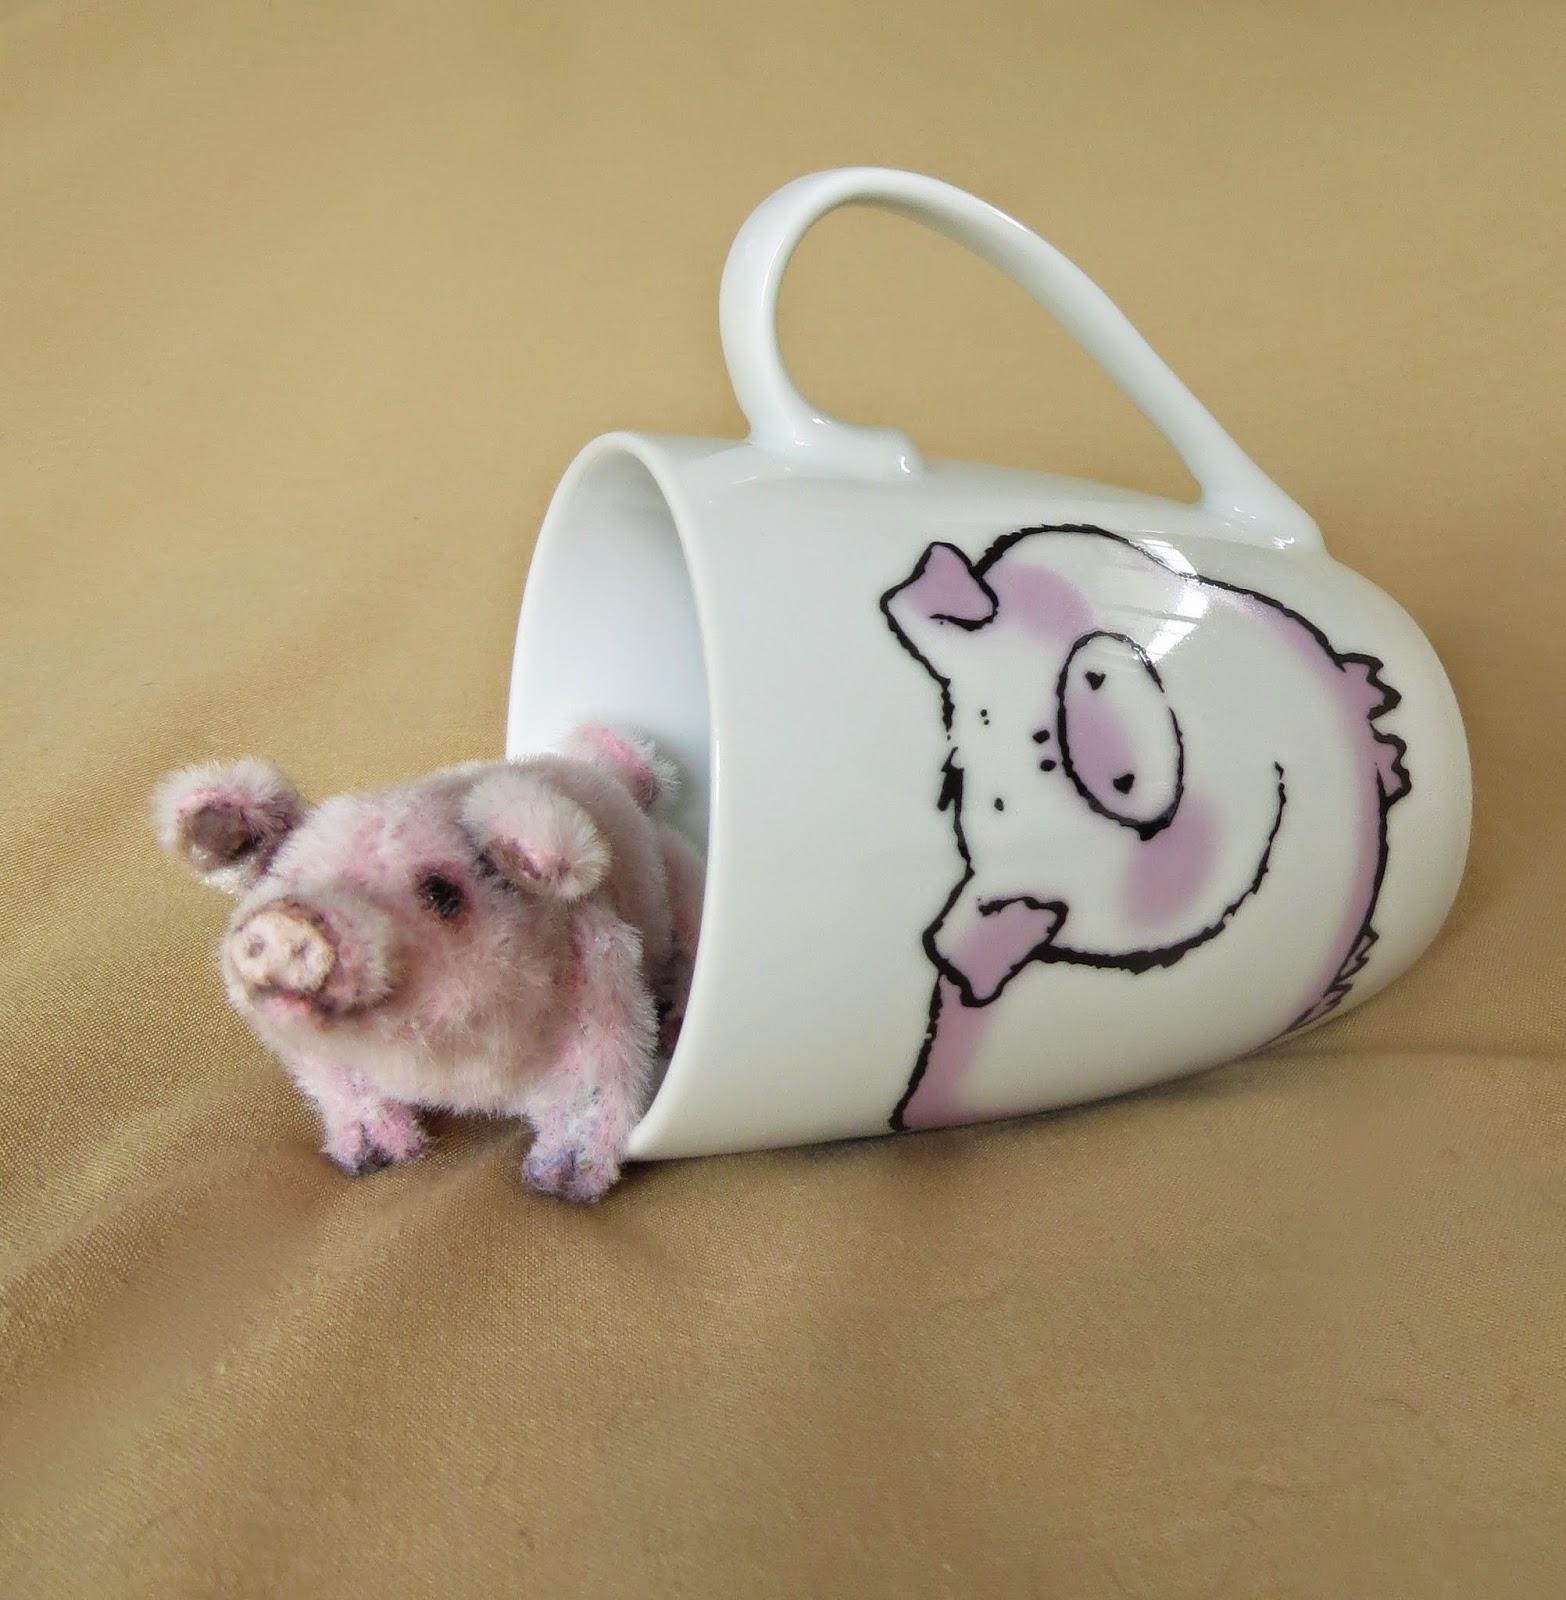 Eddybare Creations: Pearl - Teacup Piglet